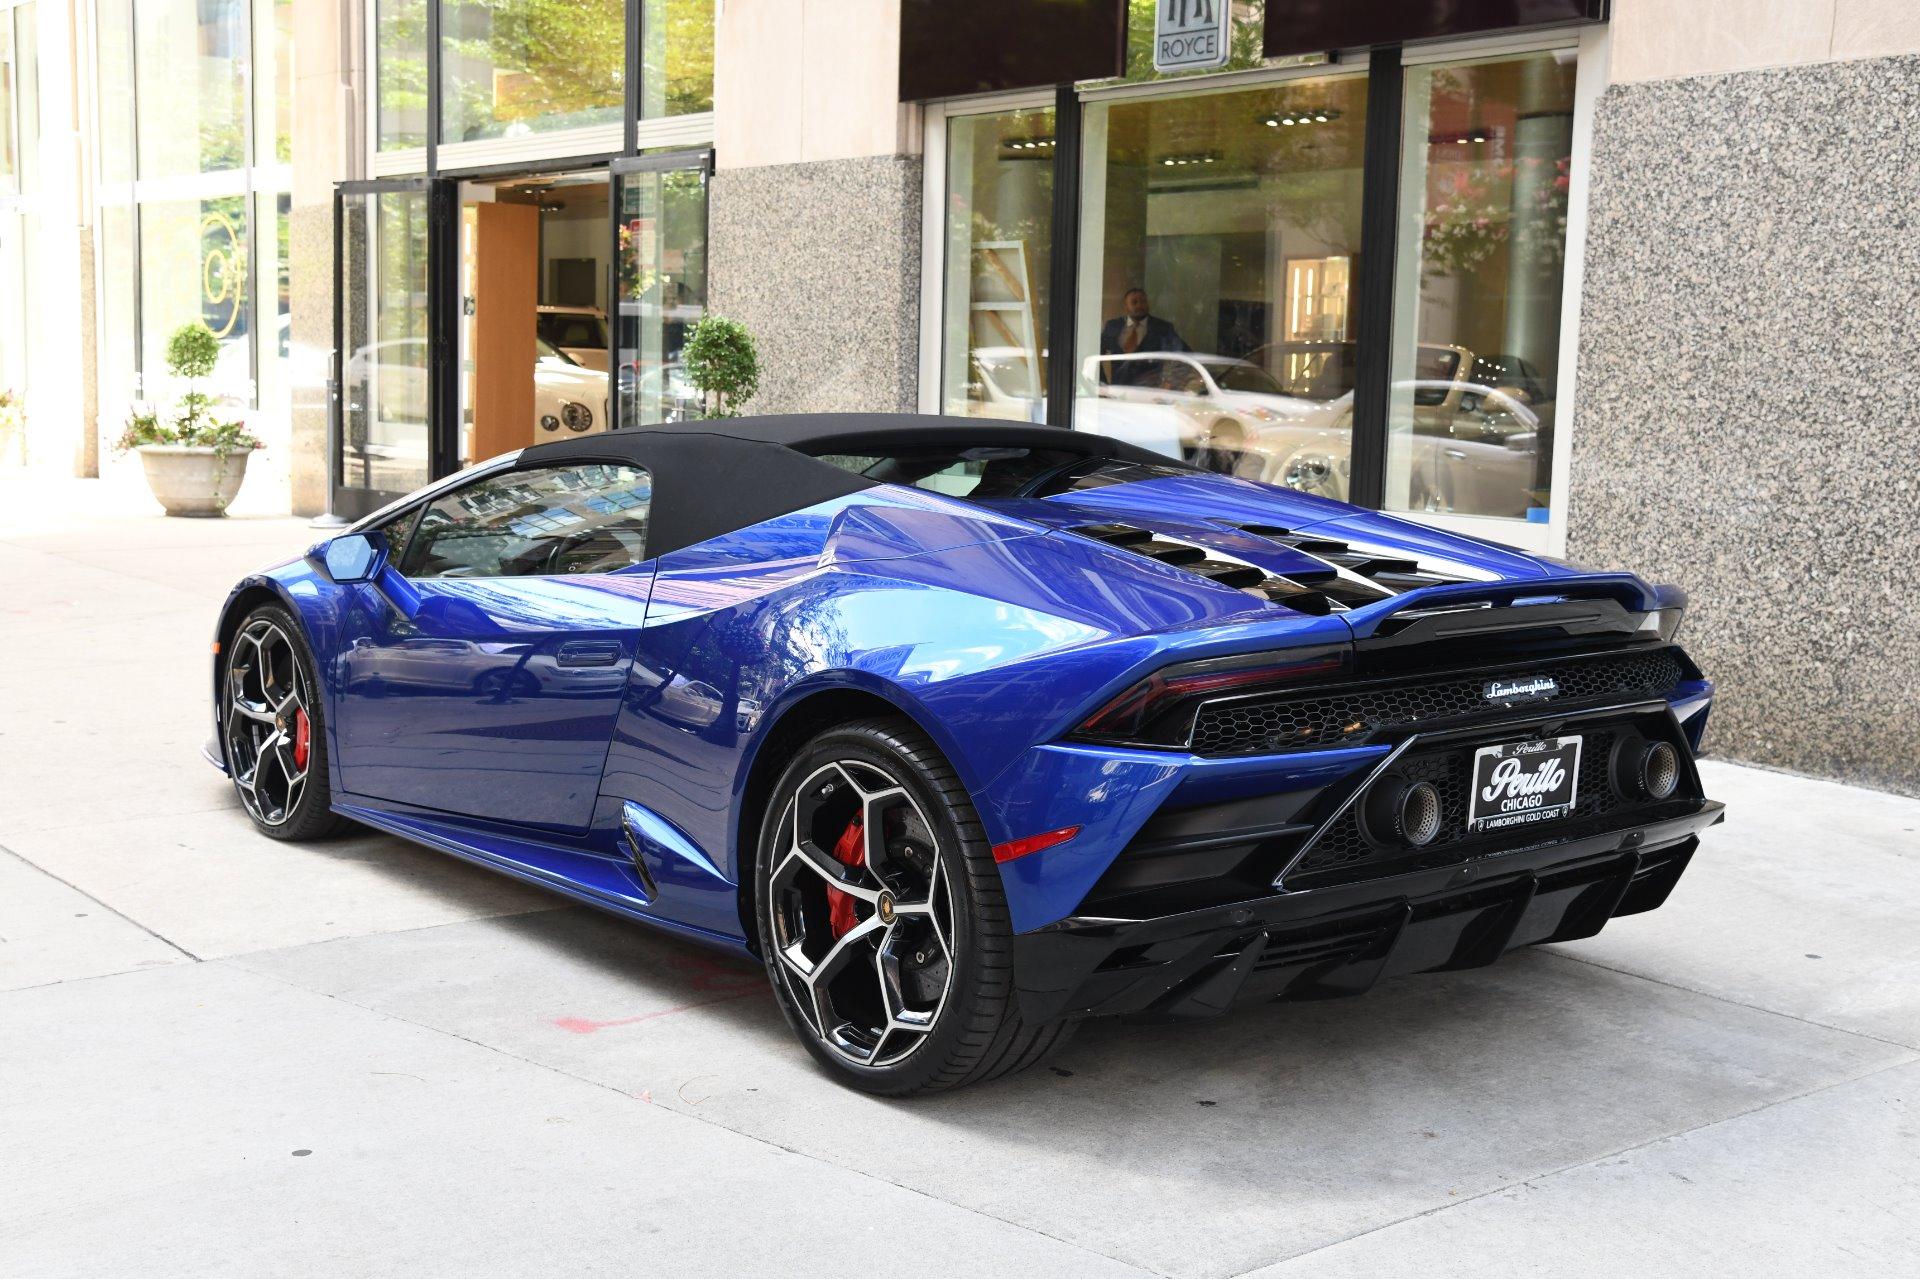 2020 Lamborghini Huracan Evo Spyder Lp 640 4 Evo Spyder